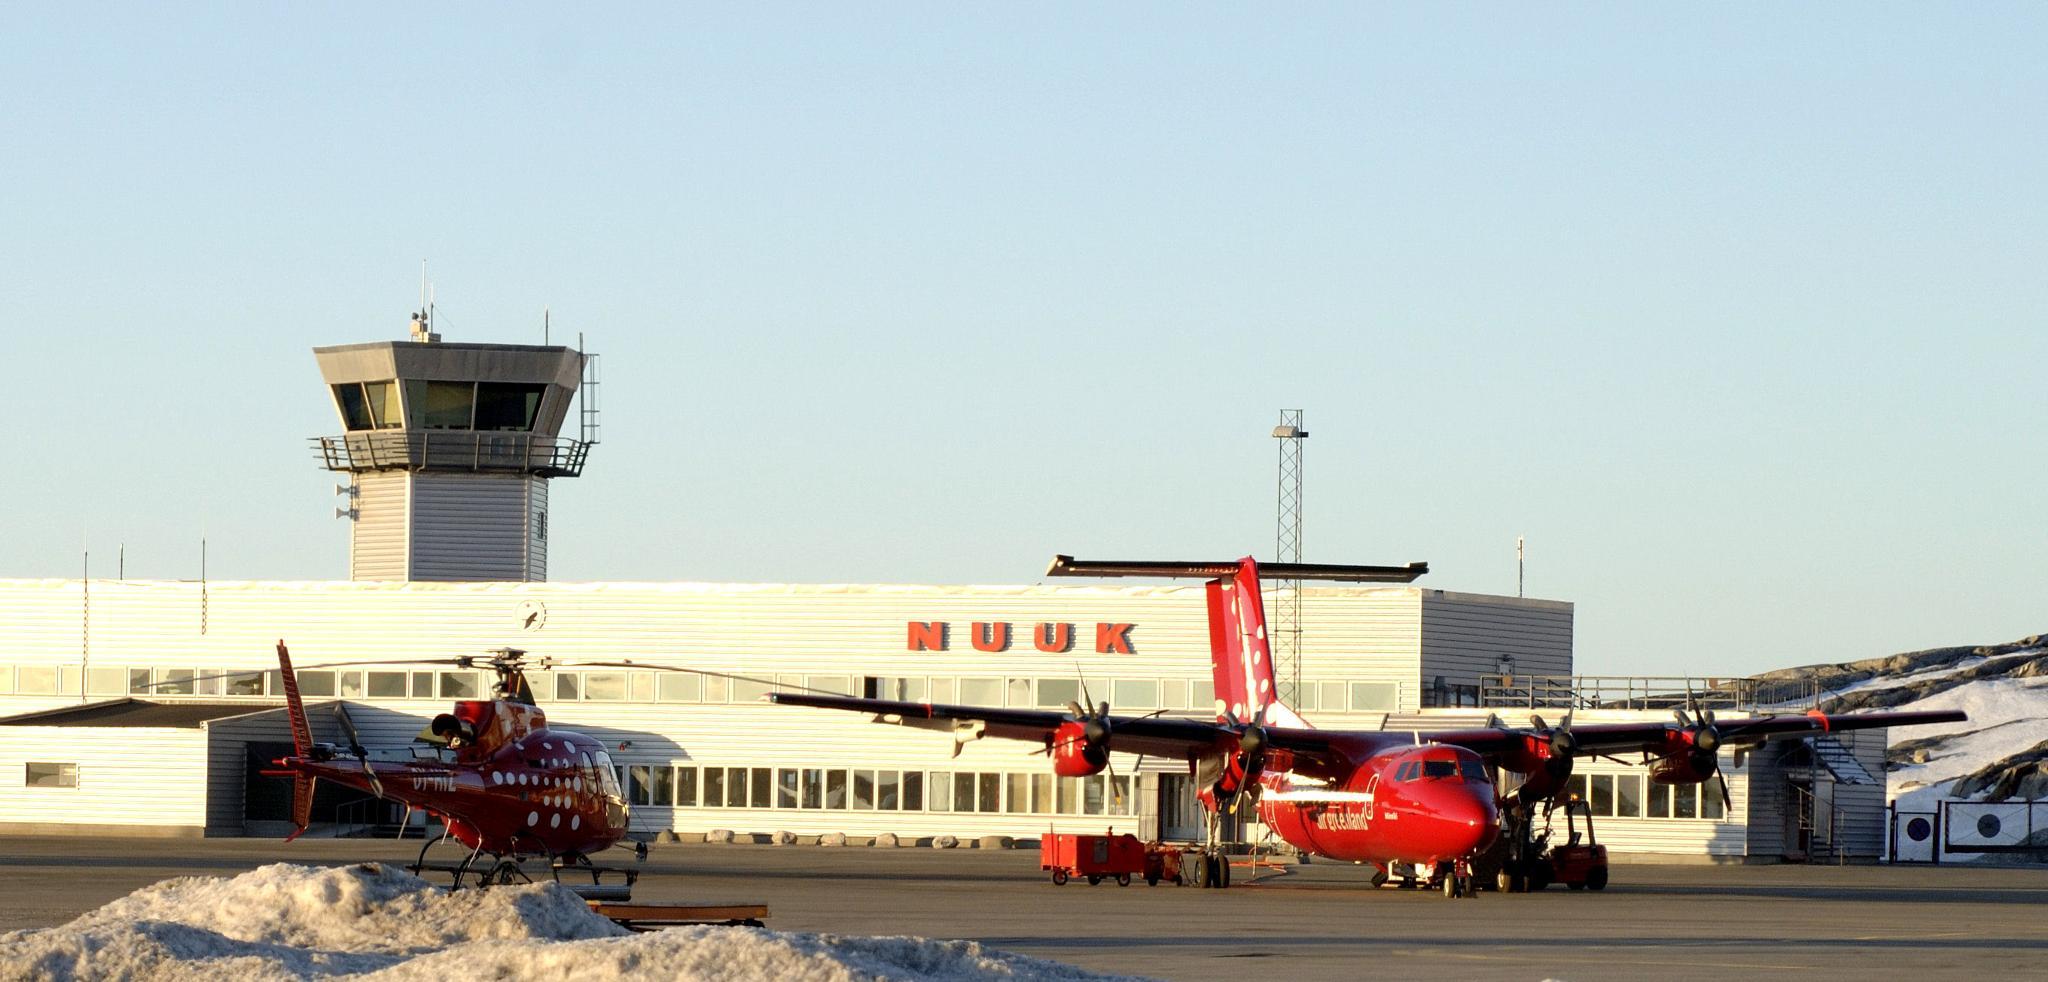 Nuuk airport. by Tom Augo Lynge